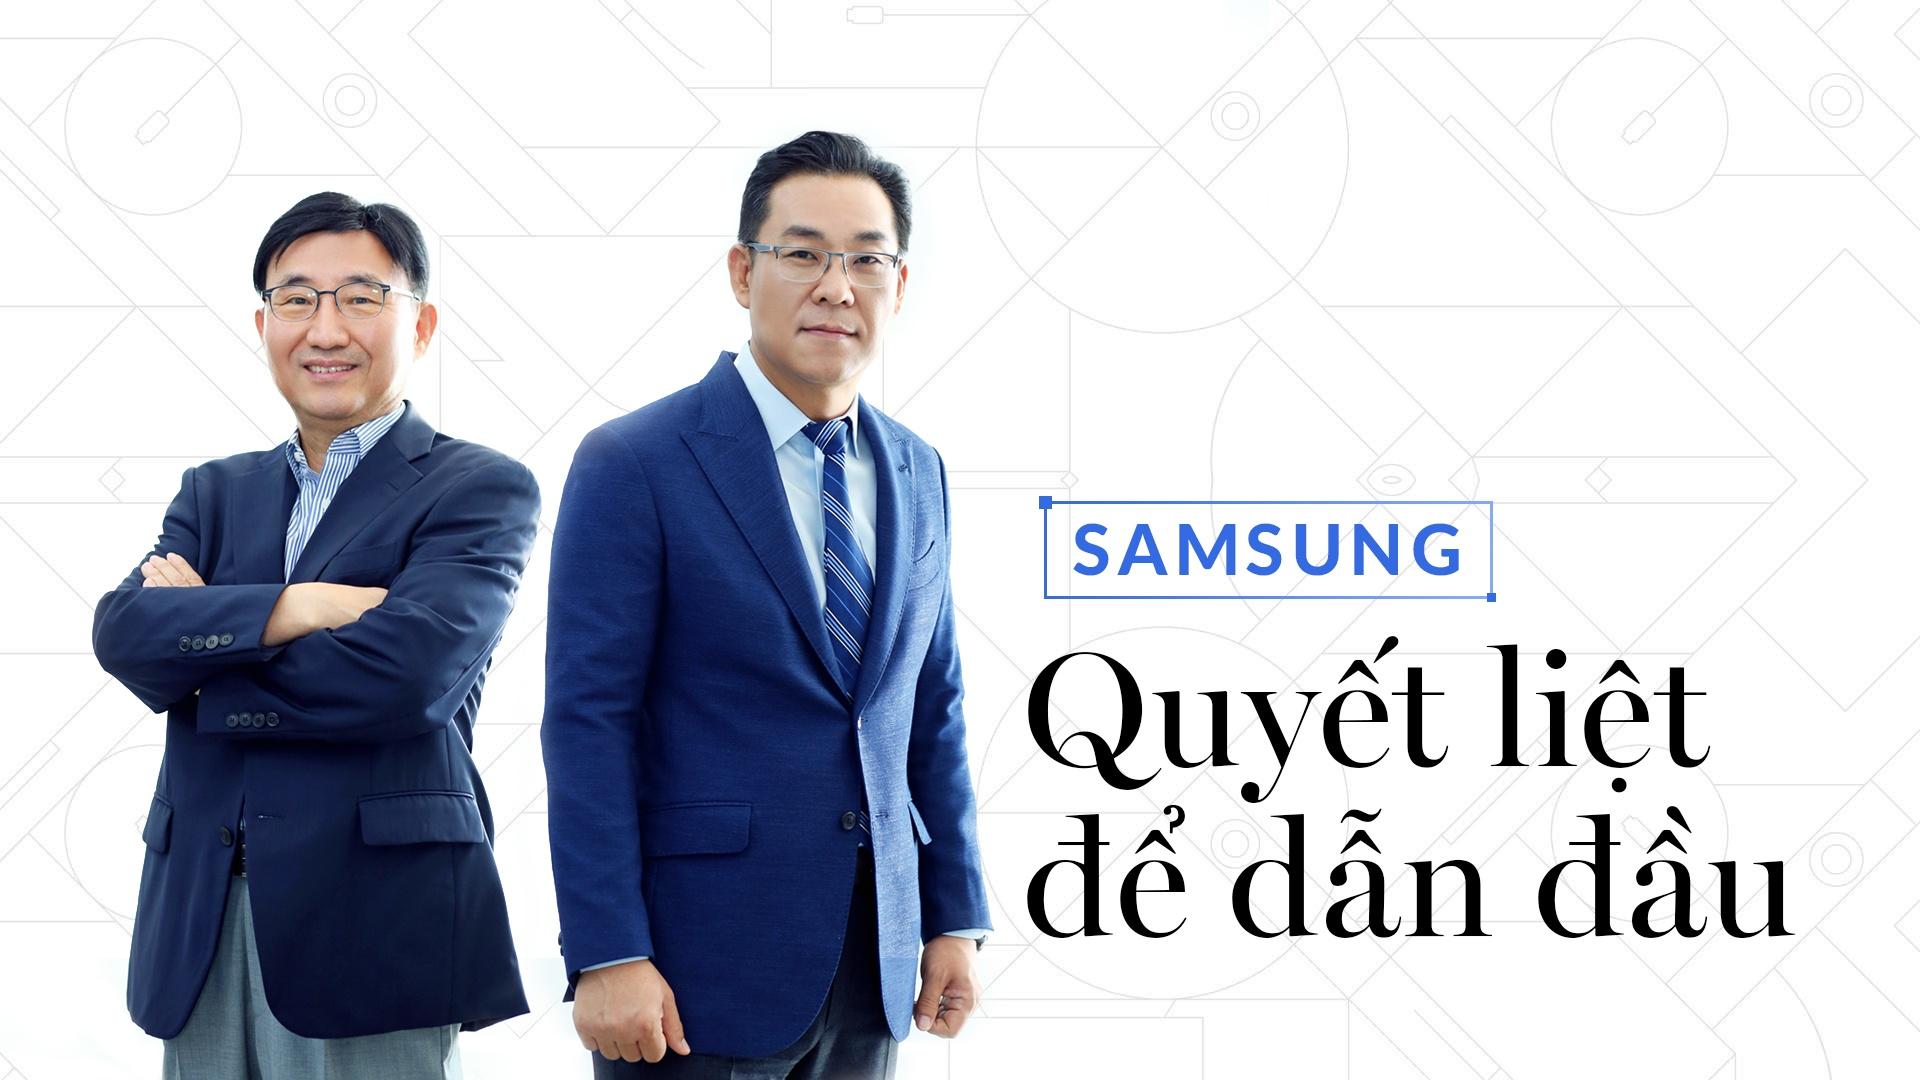 Tong giam doc Samsung Vina chia se cach dan dau thi truong Viet Nam hinh anh 2